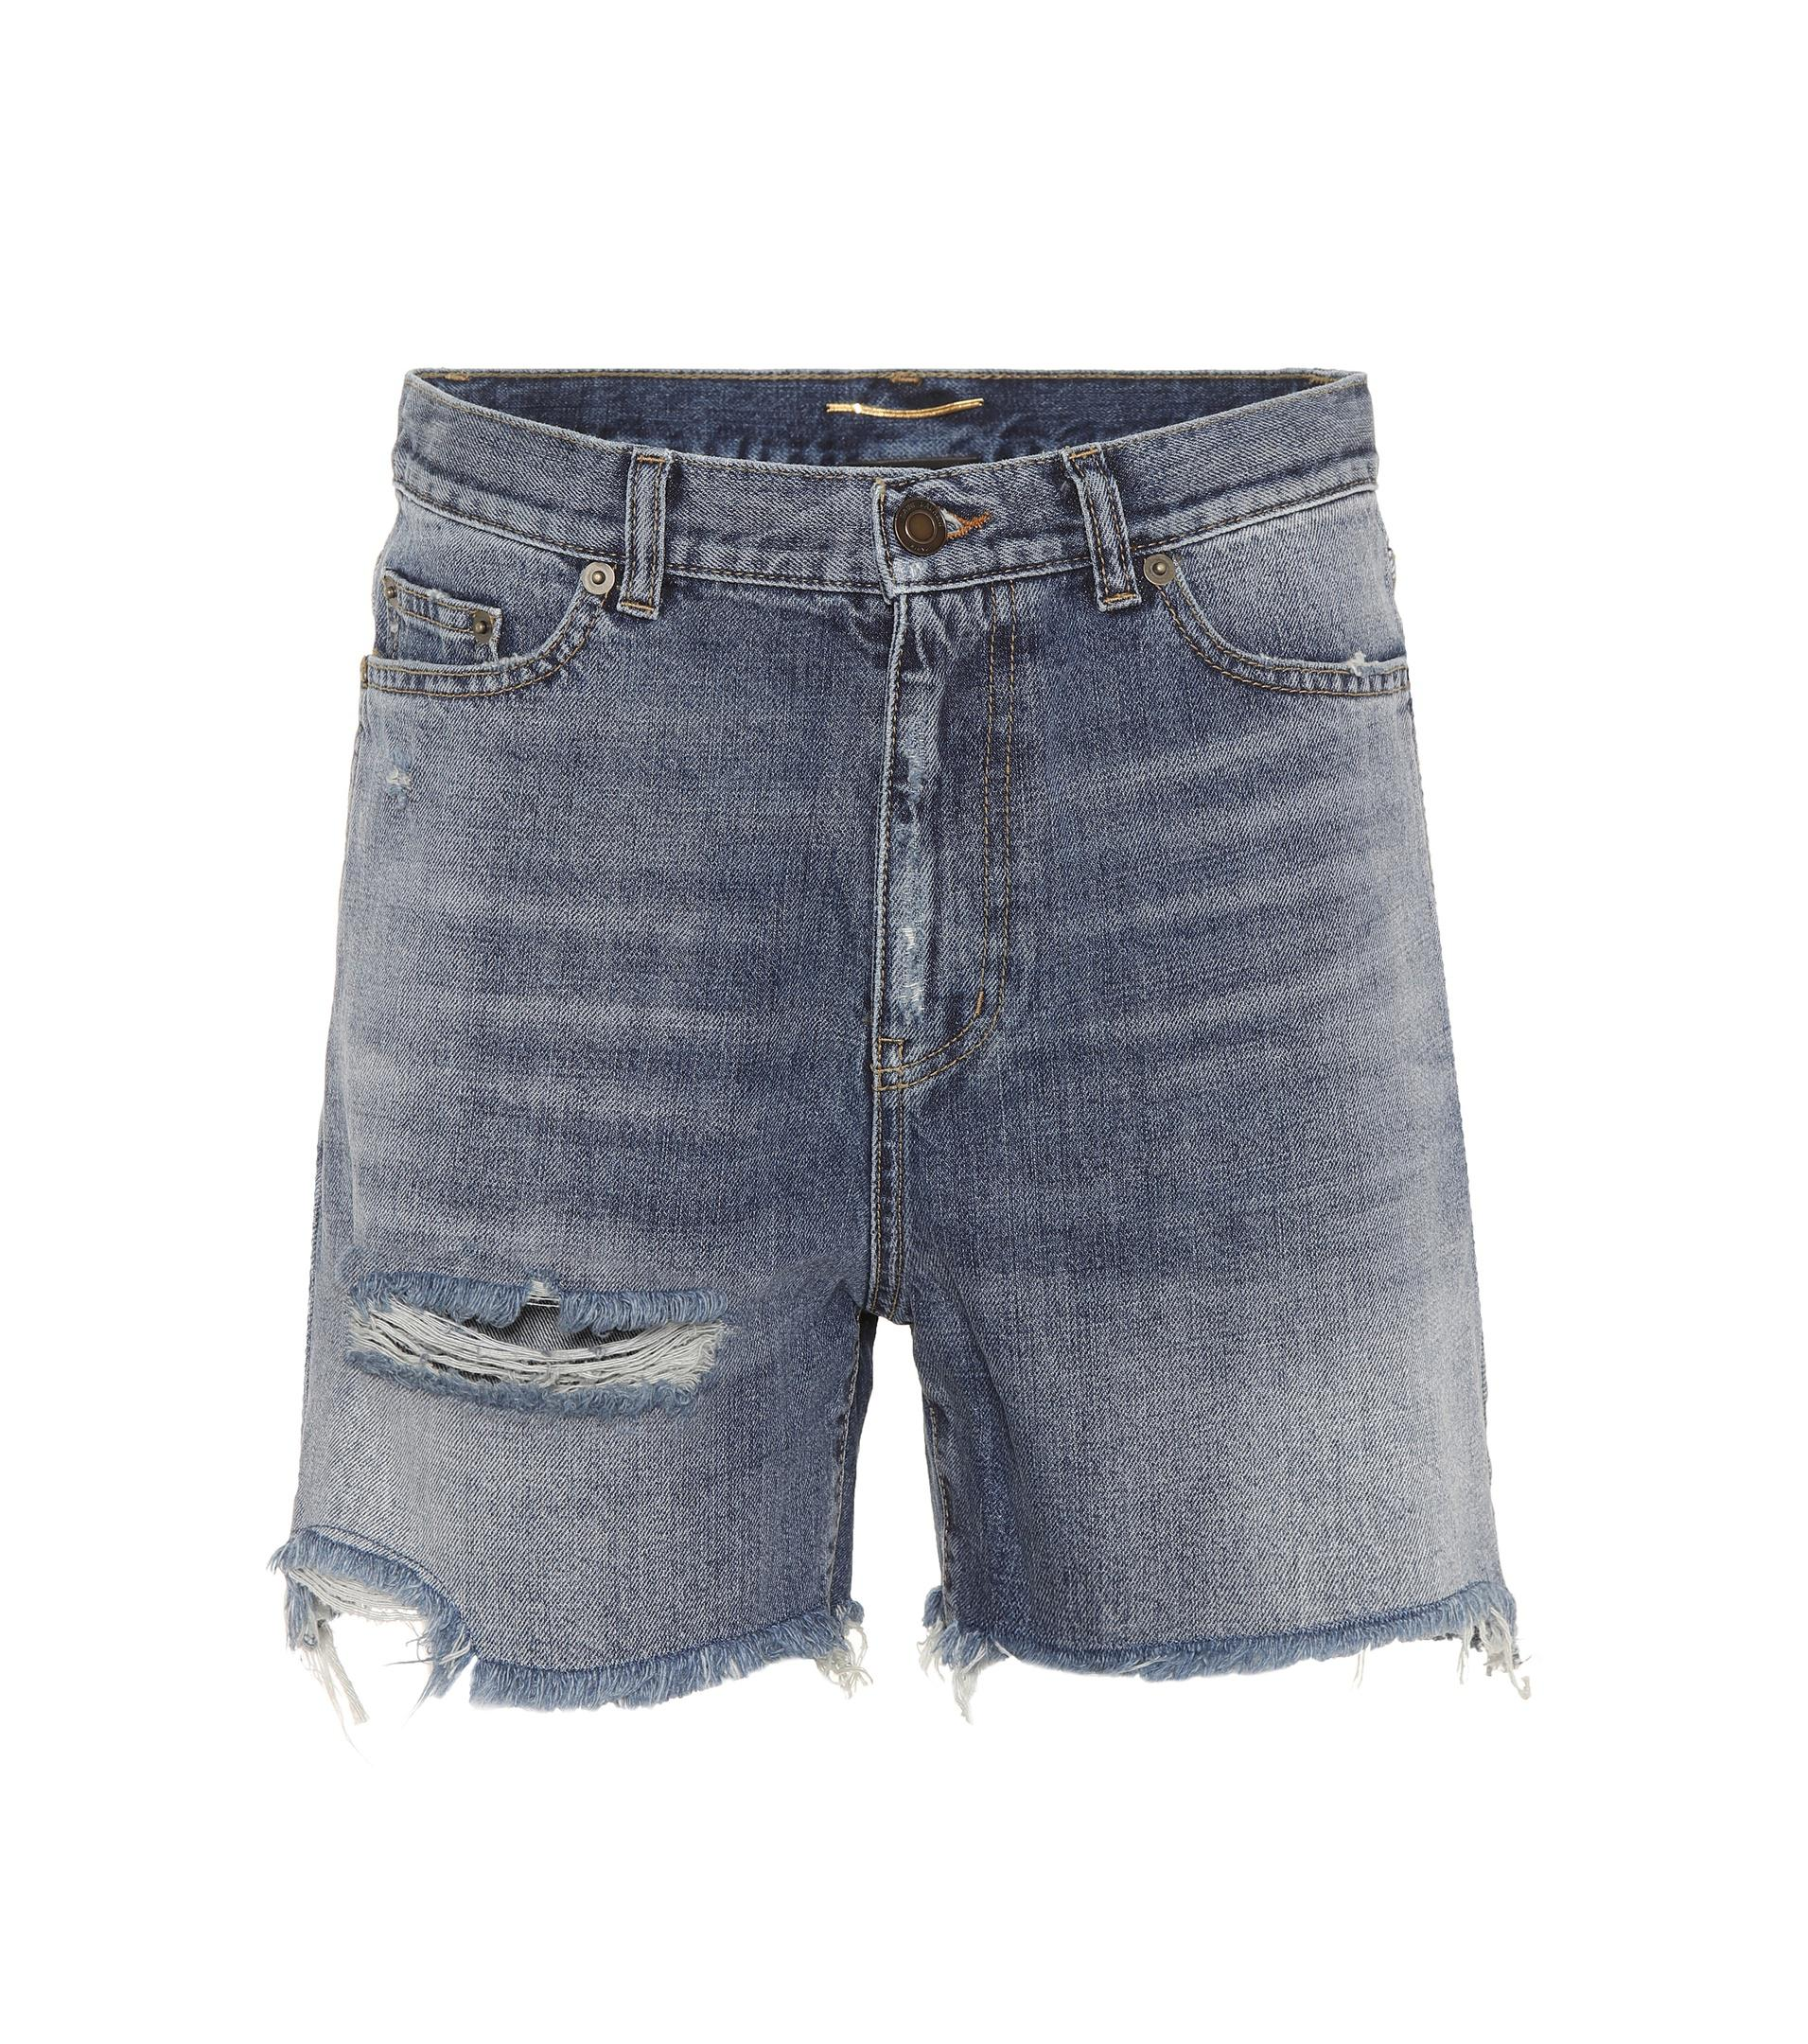 classic denim shorts - Grey Saint Laurent DqjtYjKY3D